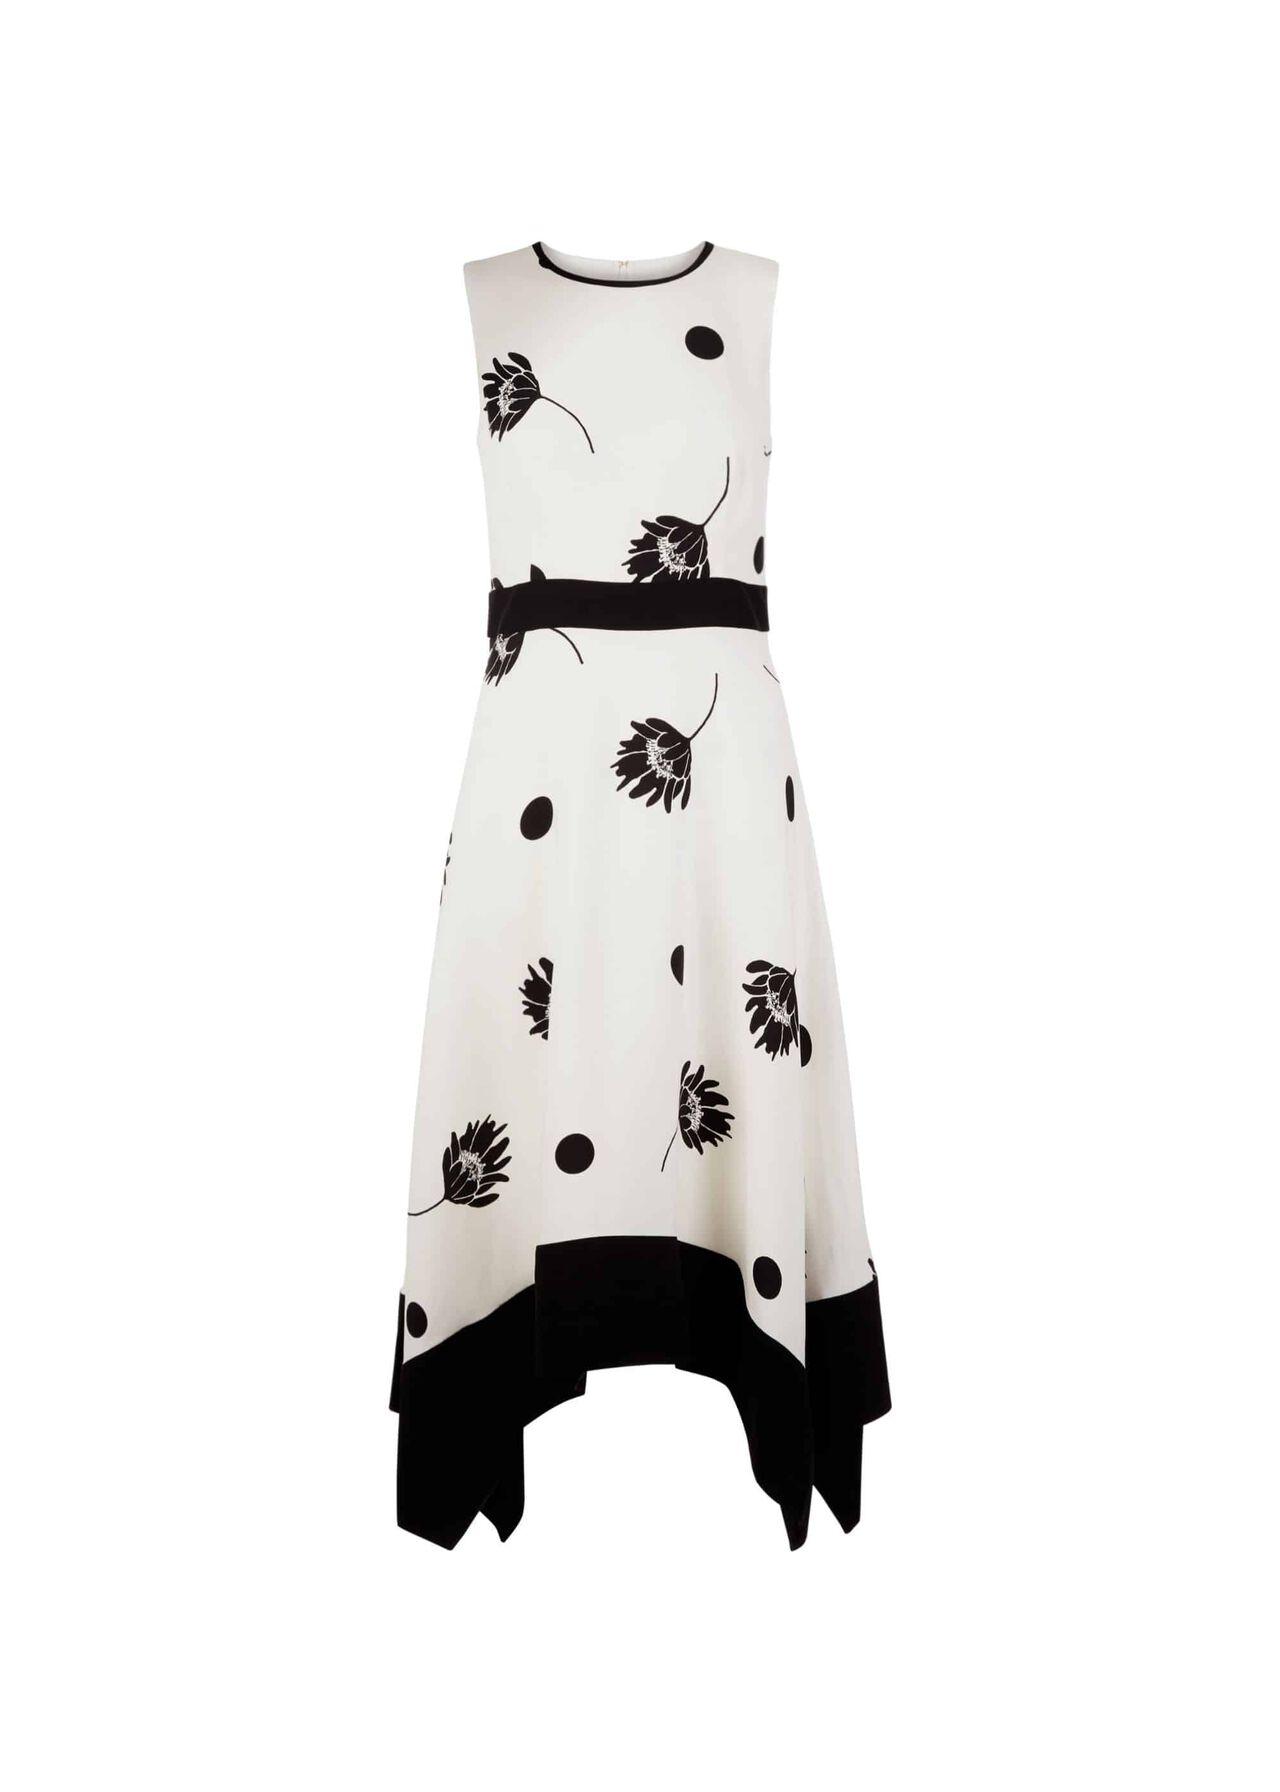 Lucie Dress Ivory Black